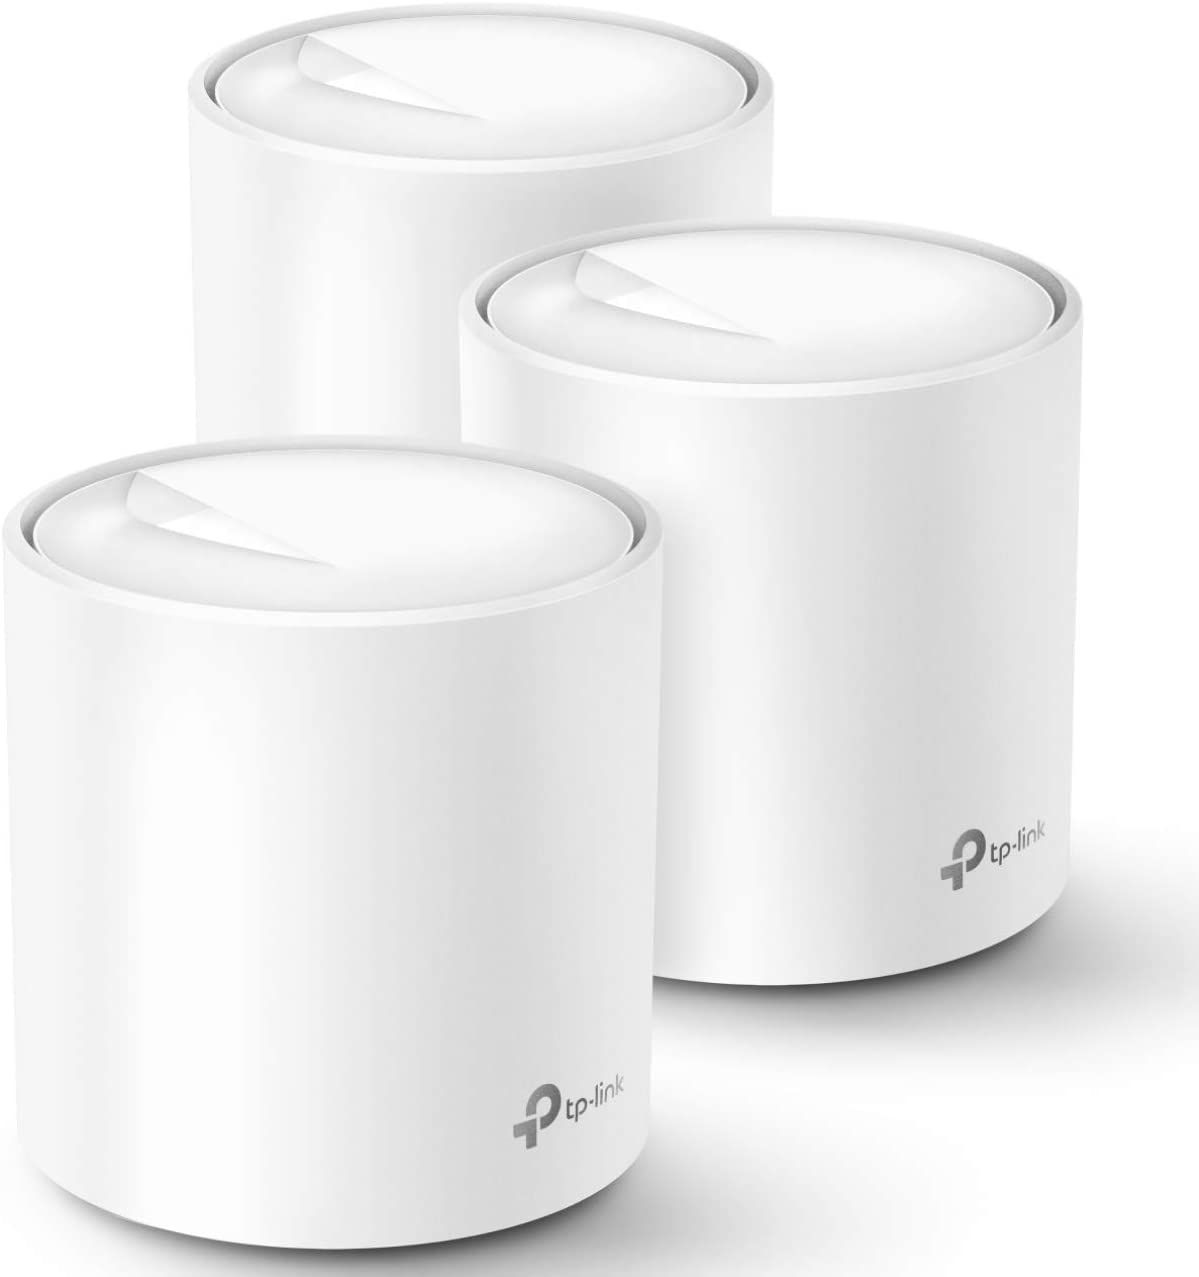 TP-Link Deco WiFi 6 Mesh WiFi System(